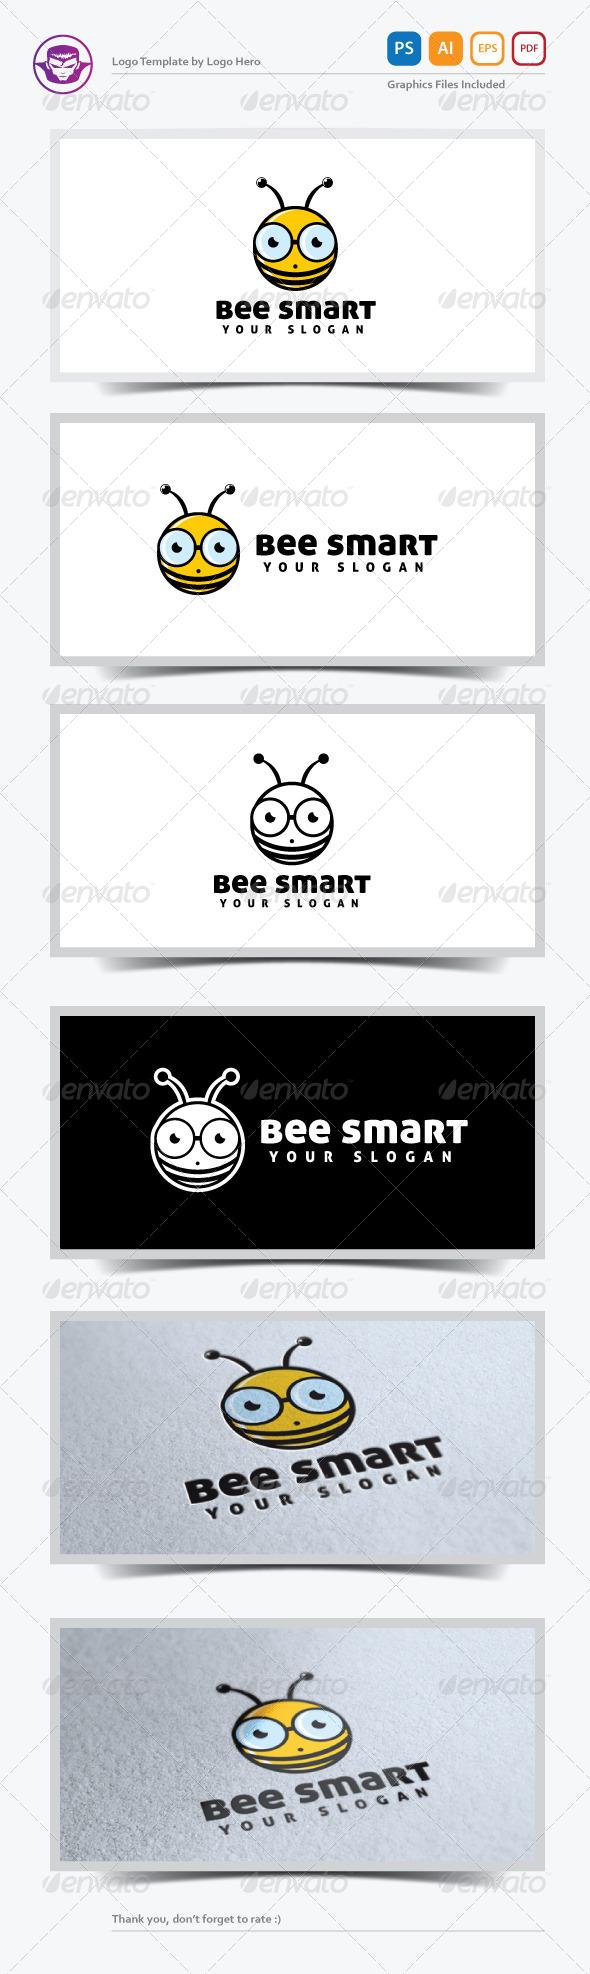 GraphicRiver Bee Smart Logo Template 5245655